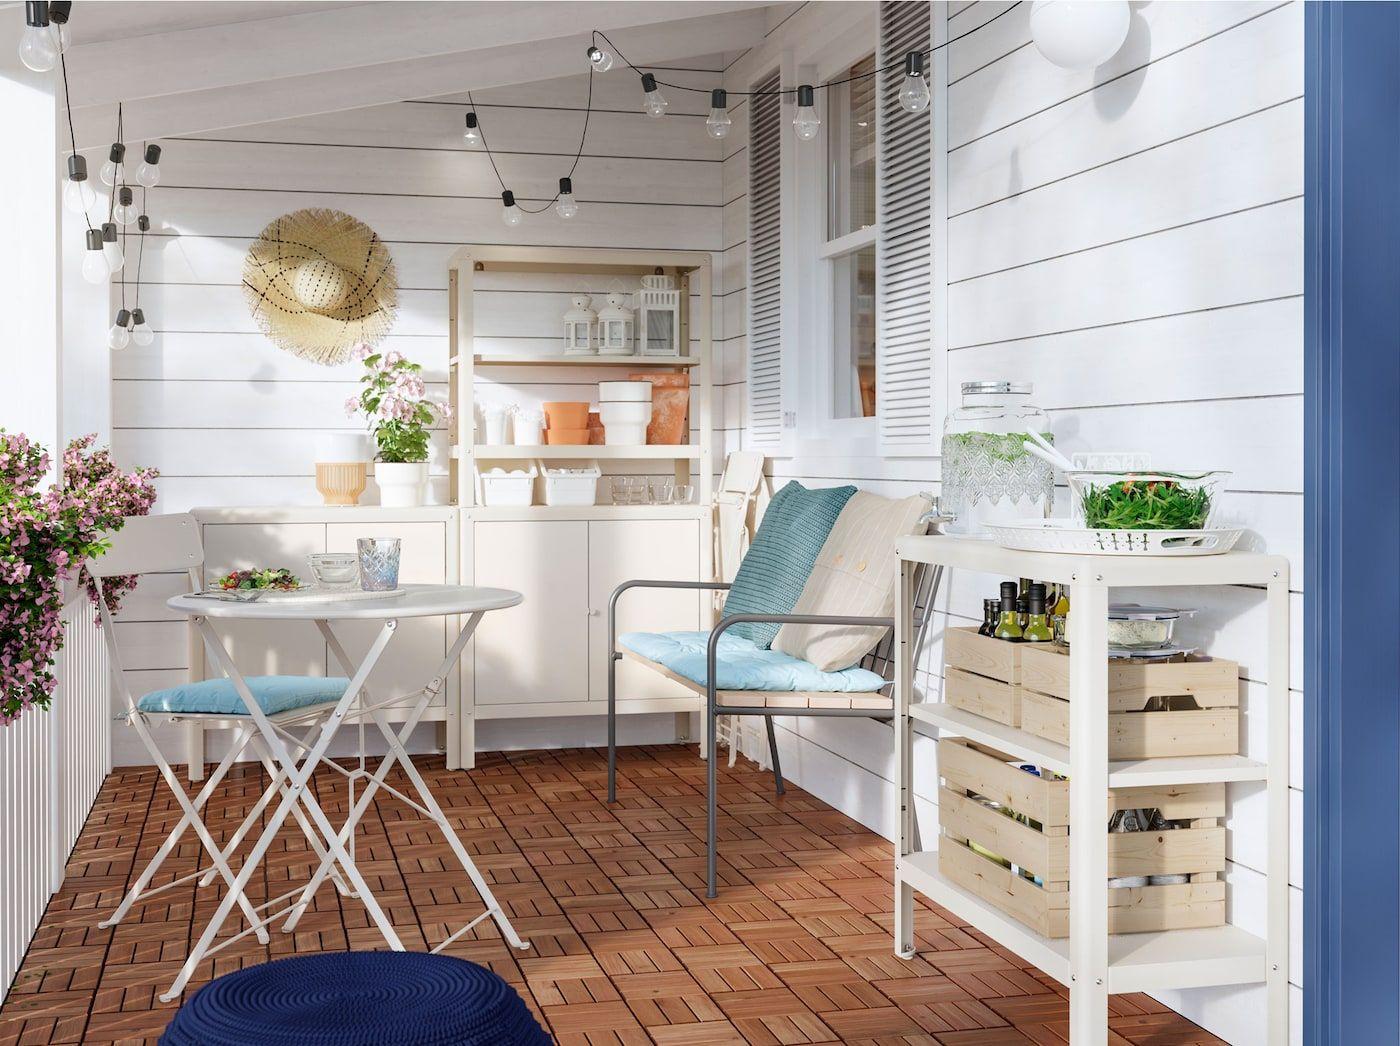 Déco Jardin : notre galerie de photos Jardin  Outdoor dining room